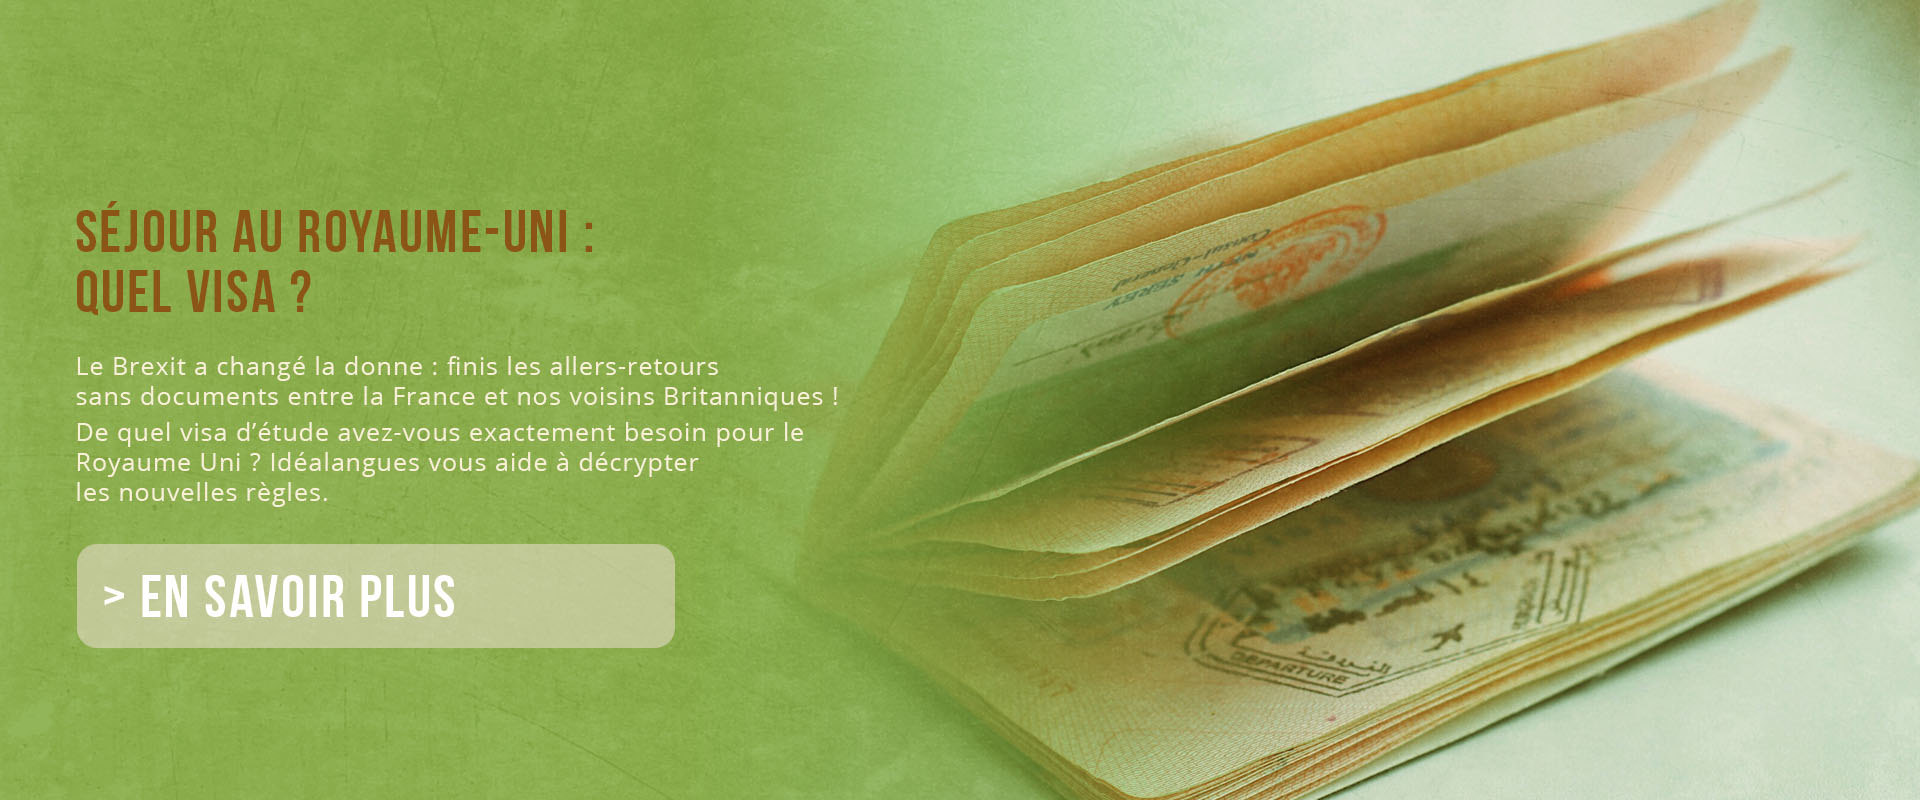 visa ru juillet 2021 slider